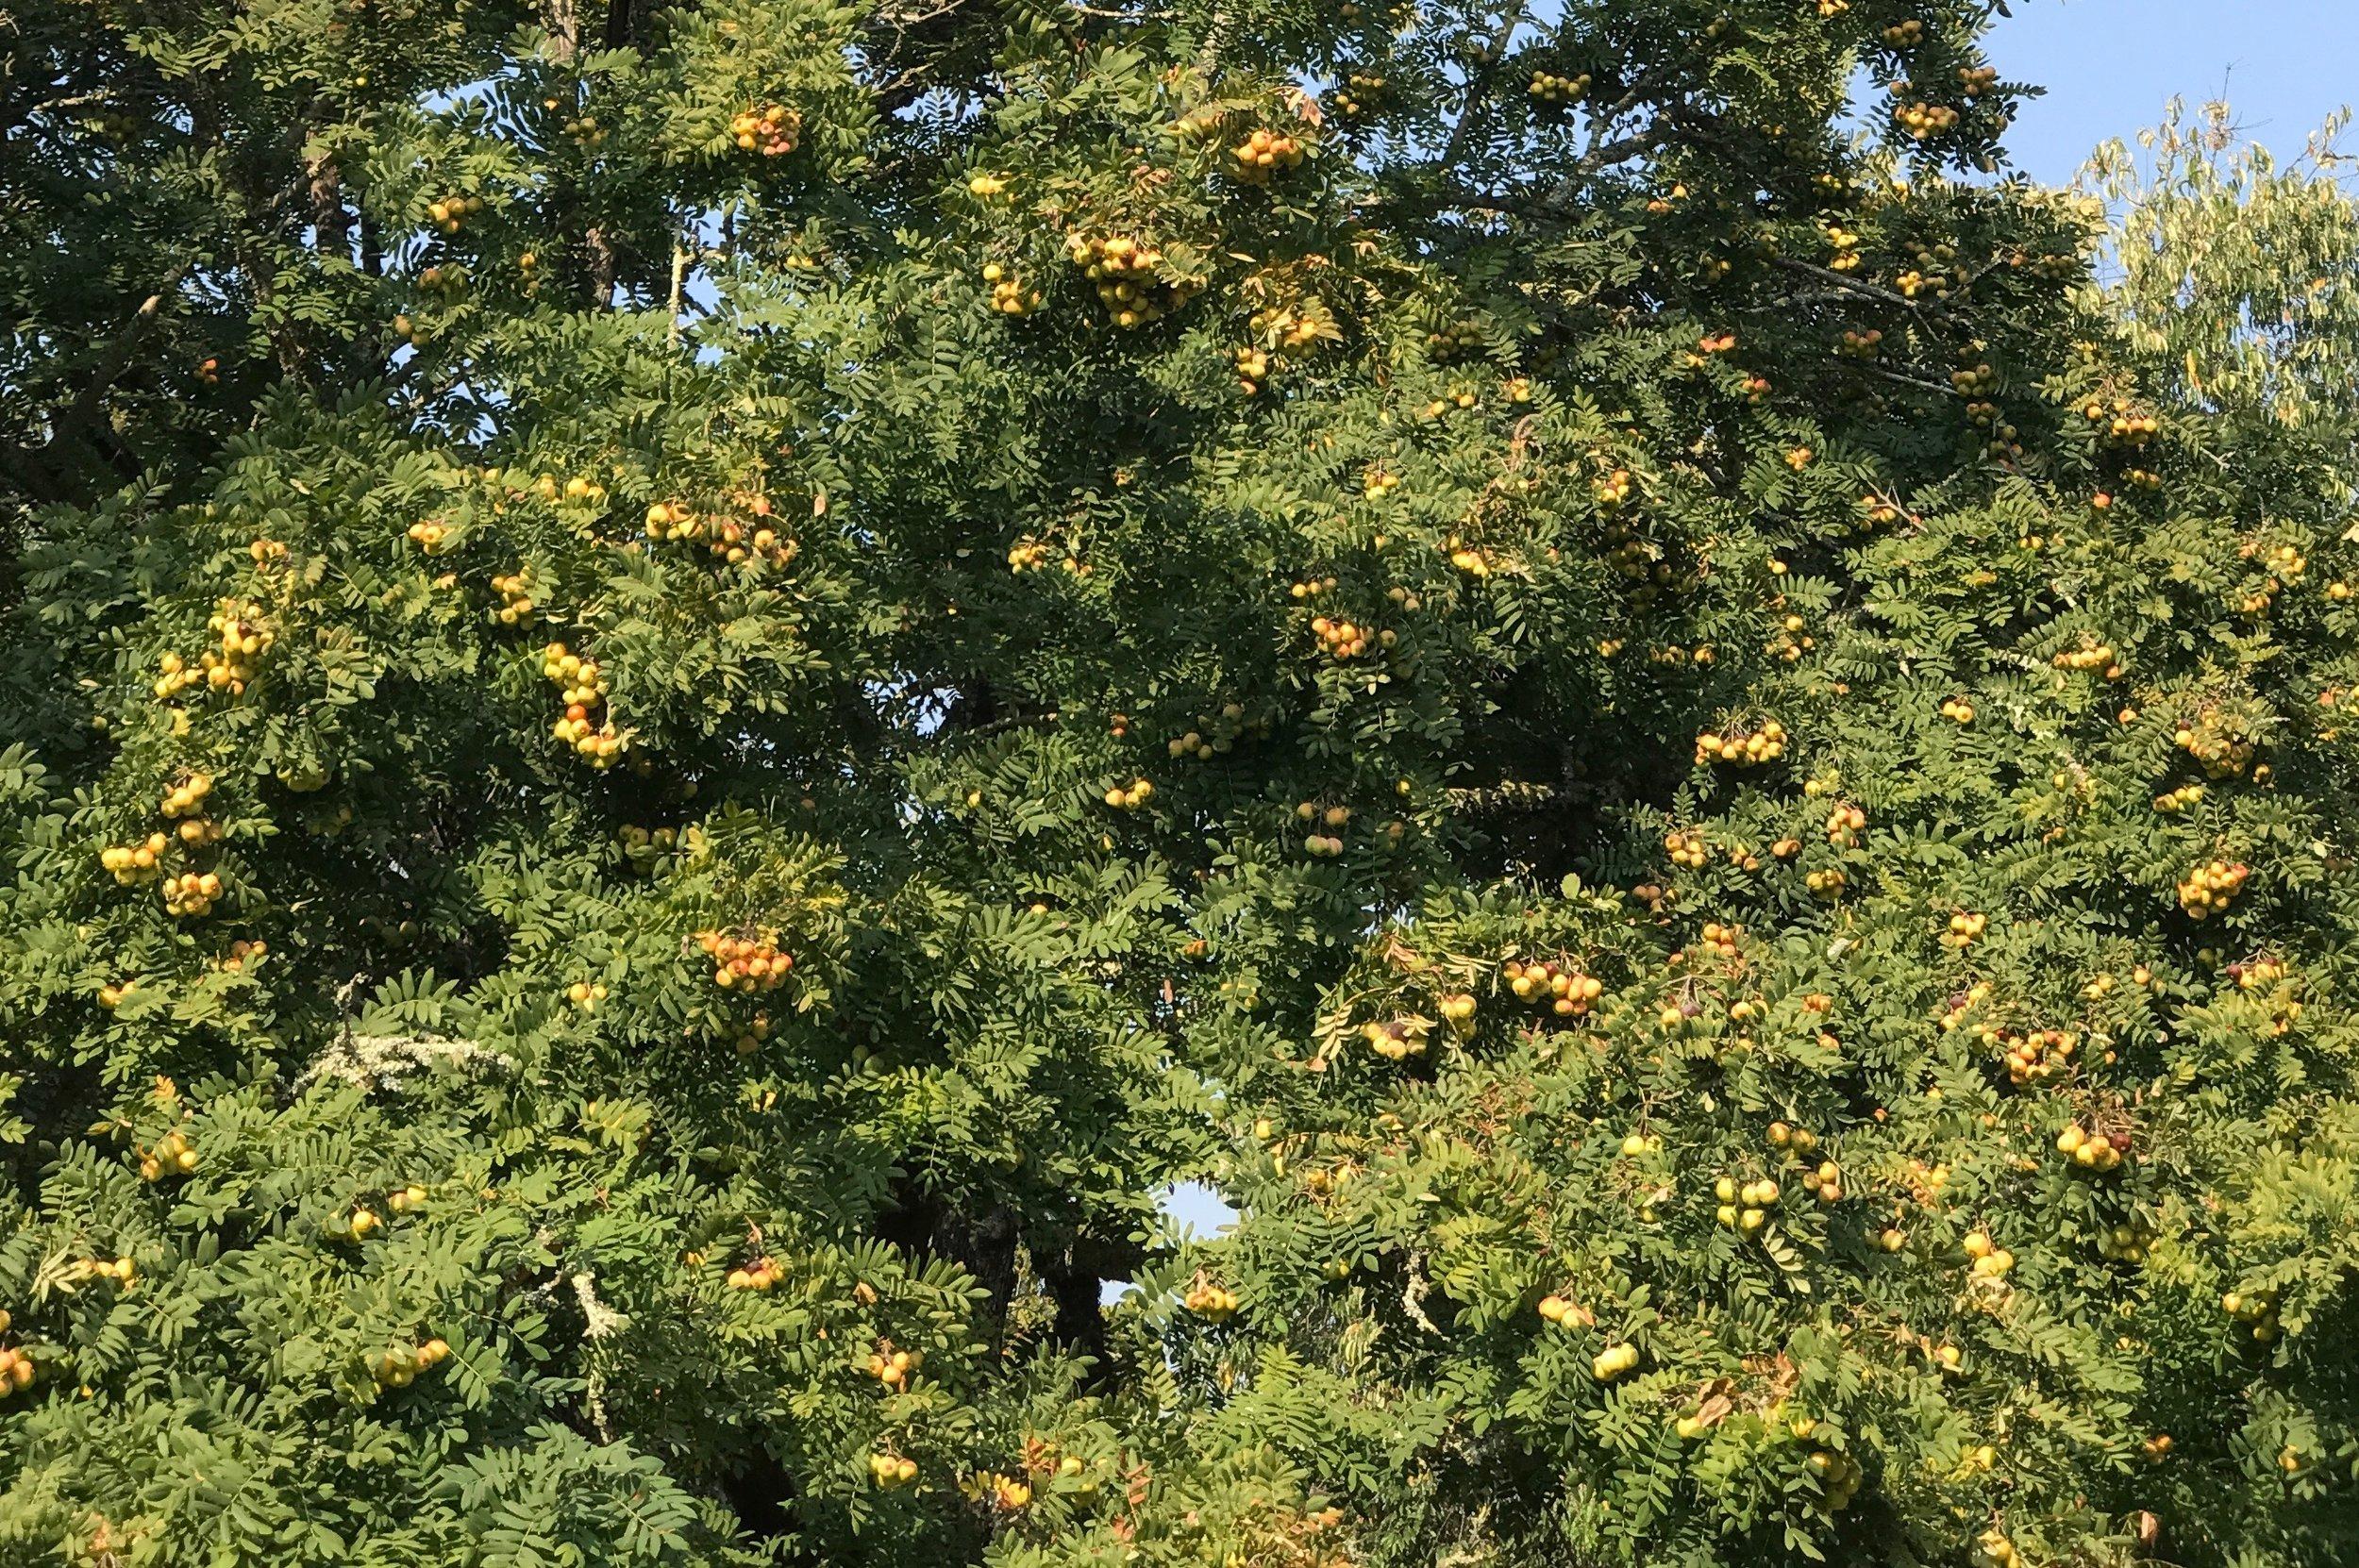 The Sorbus domestic tree at Burbank Experimental farm halfway through the fruiting season. Very productive trees.